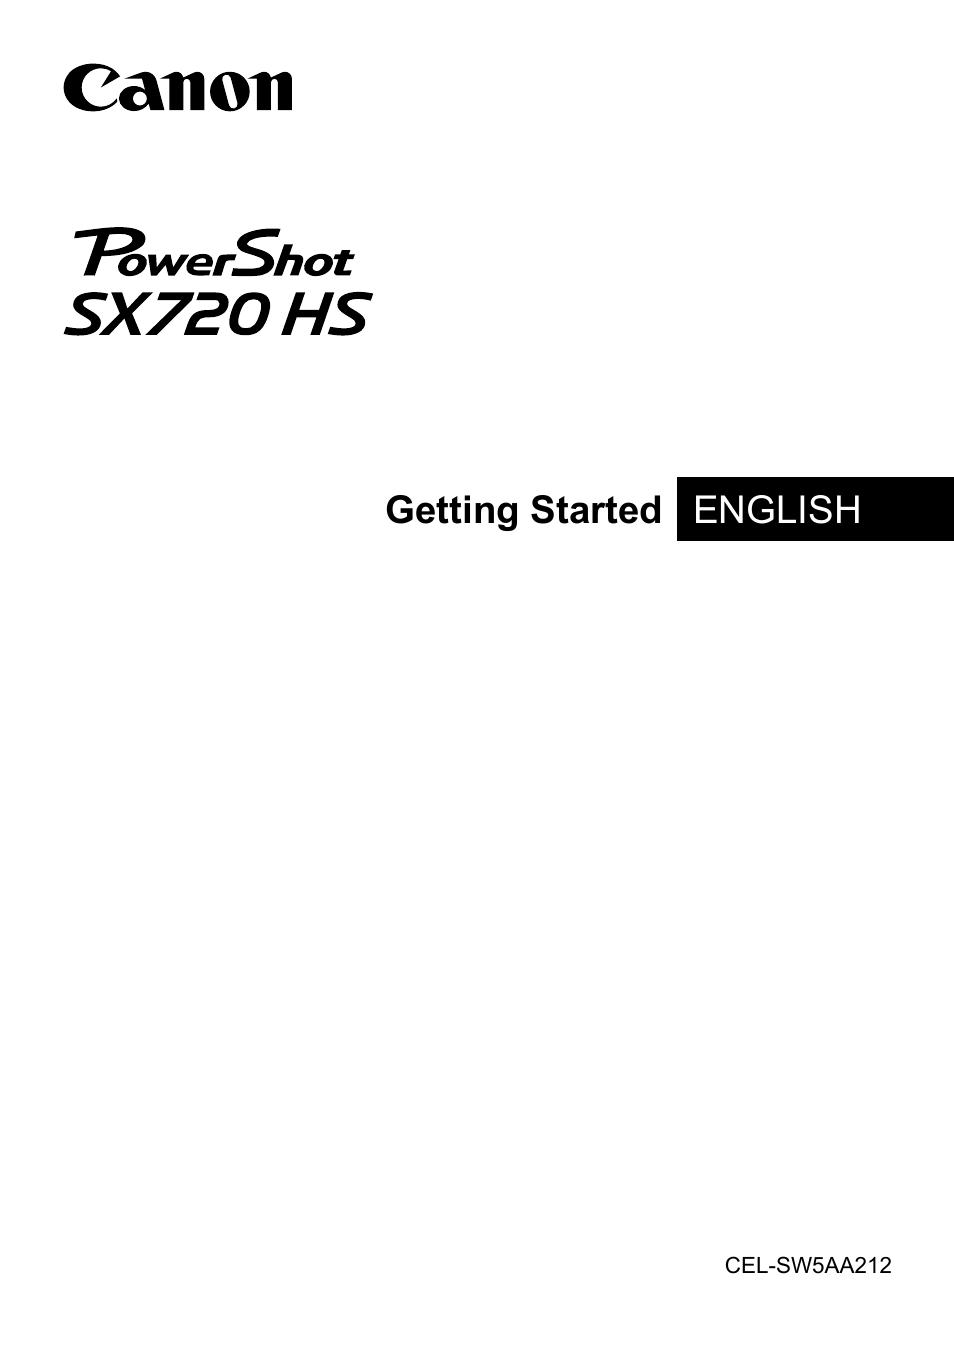 Canon PowerShot SX720 HS User Manual